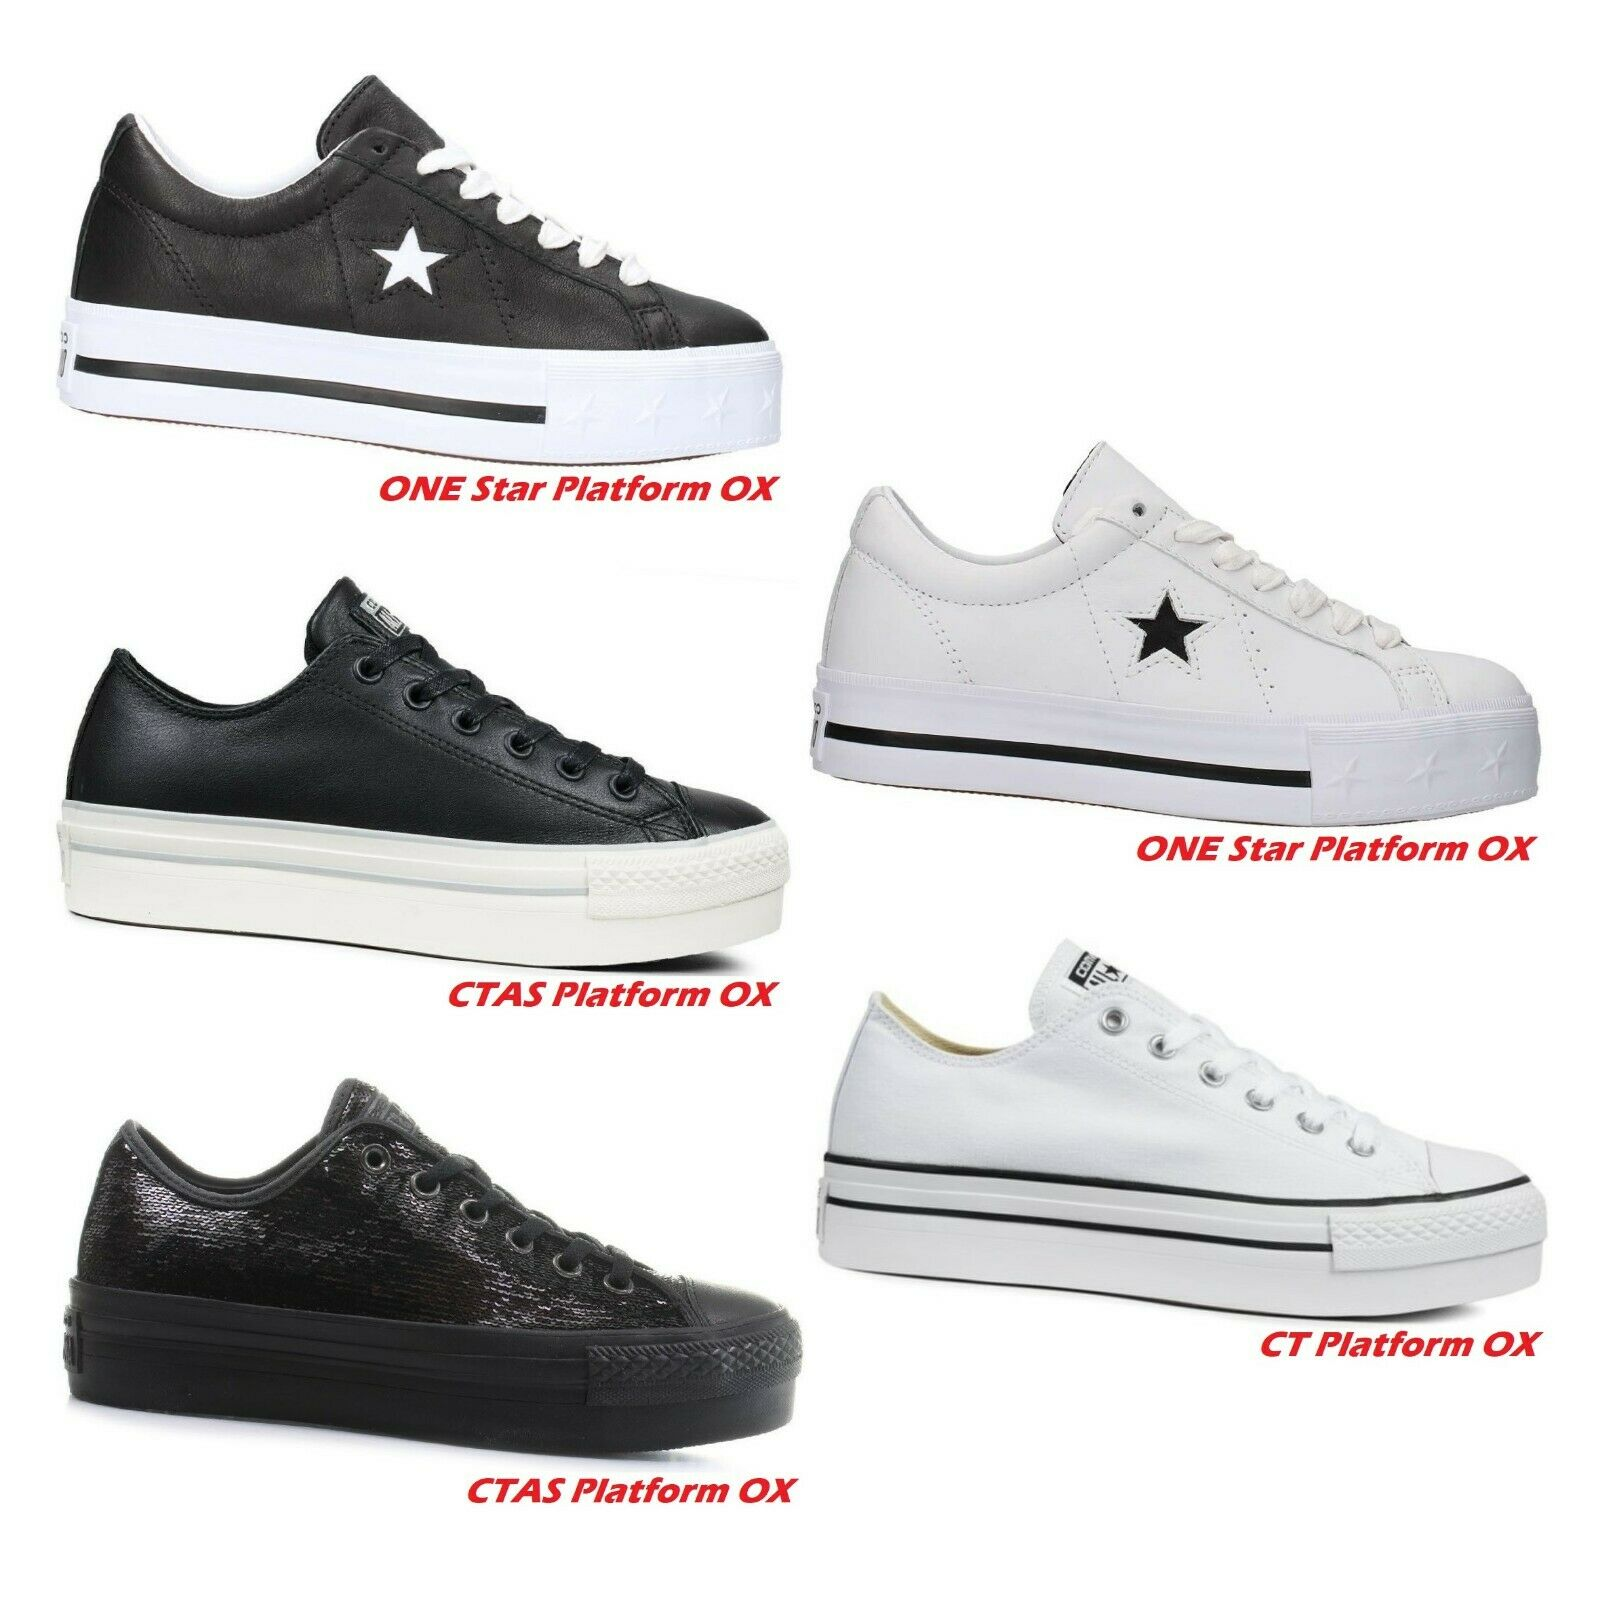 Chuck Taylor CONVERSE All Star ct platform ox scarpe donna bambina zeppa bianca